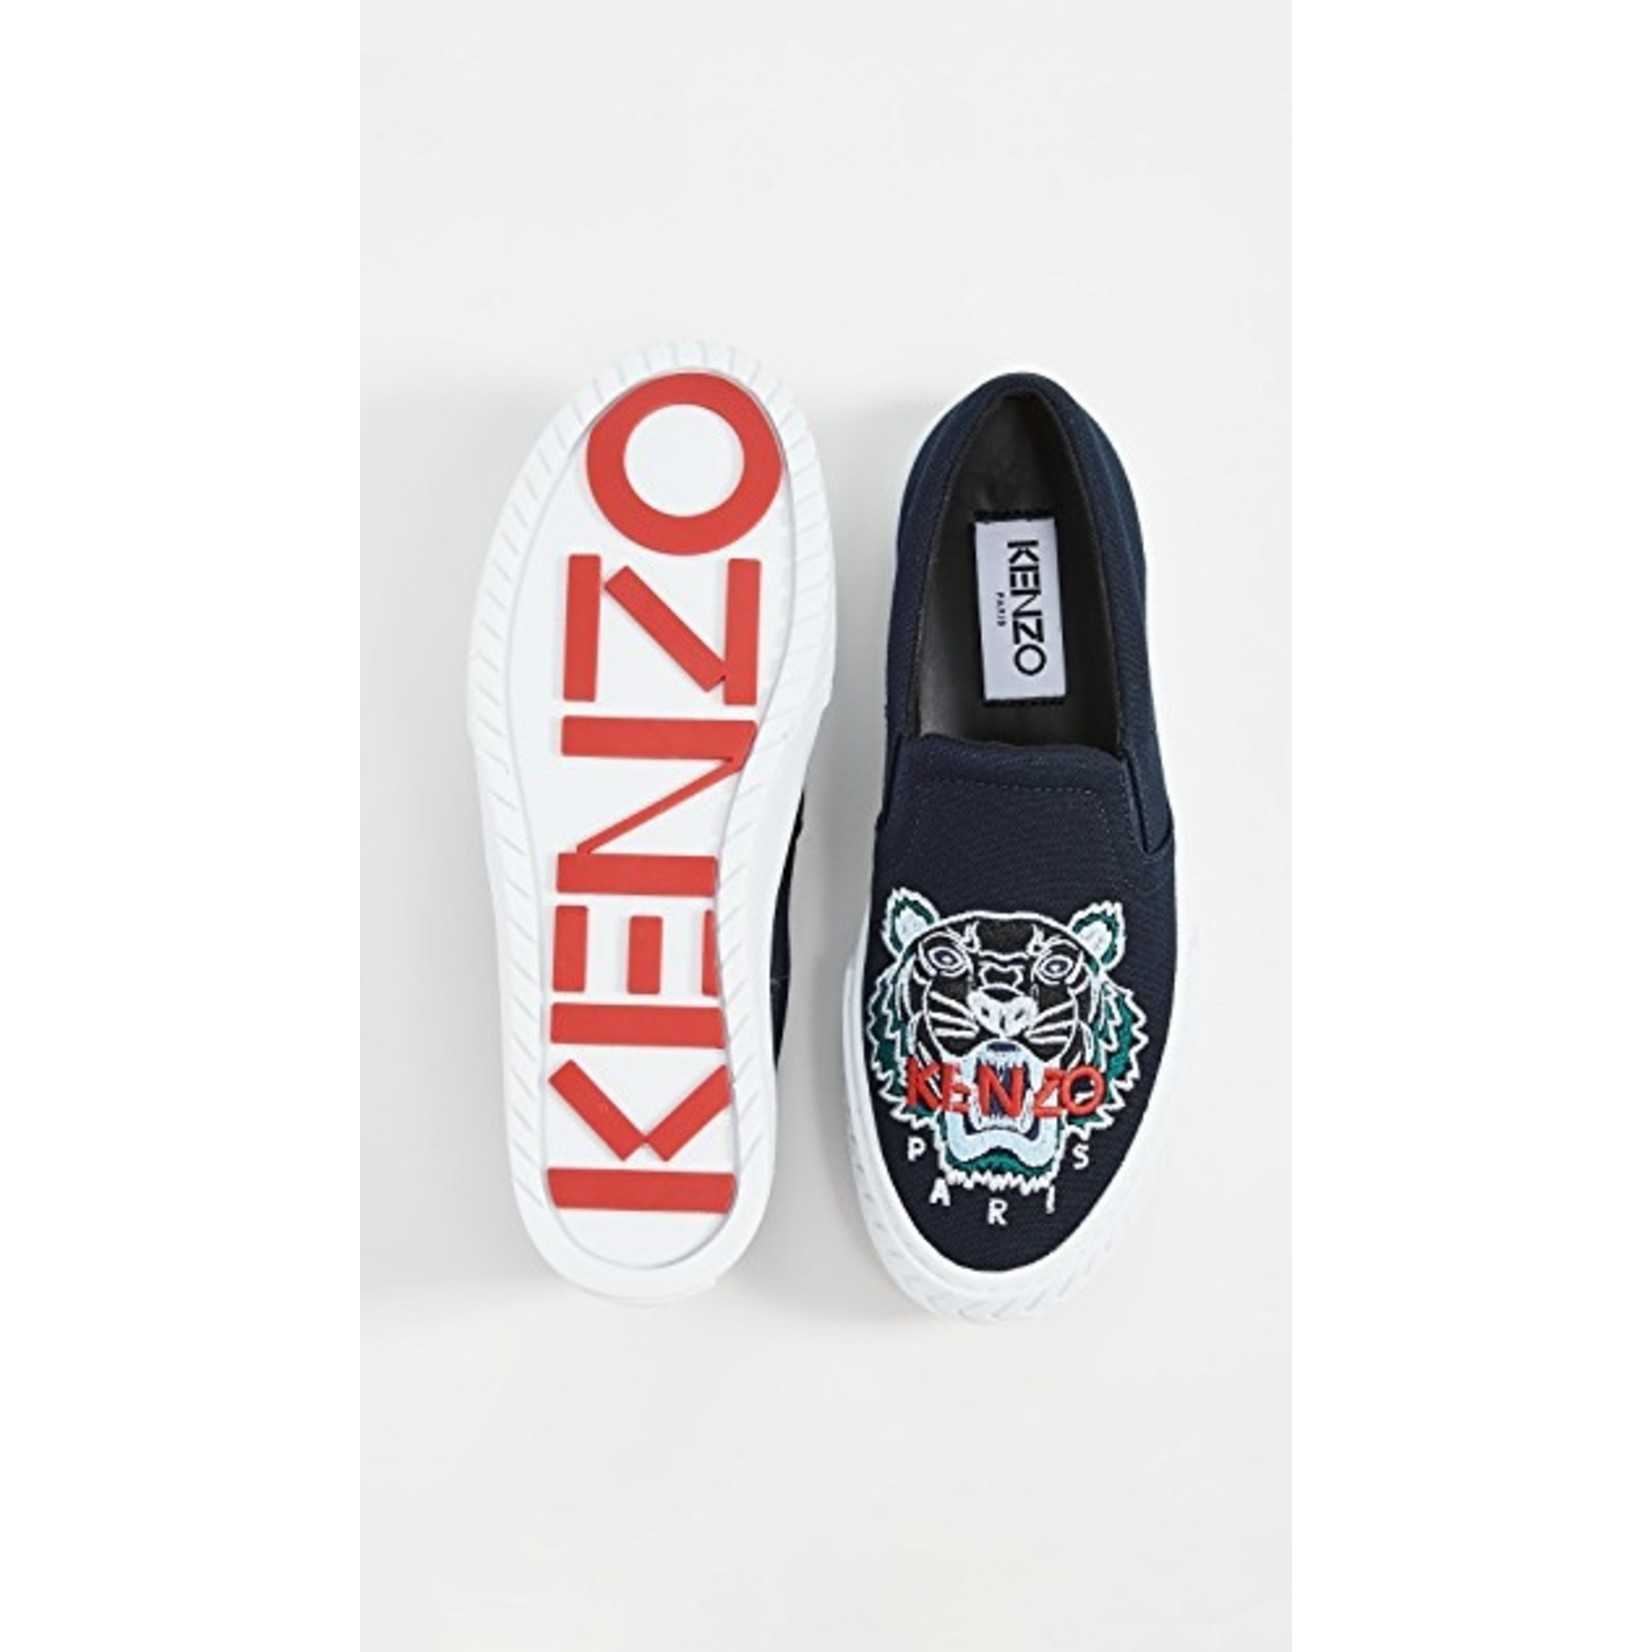 KENZO Kenzo - Baskets homme - K-Skate Tiger